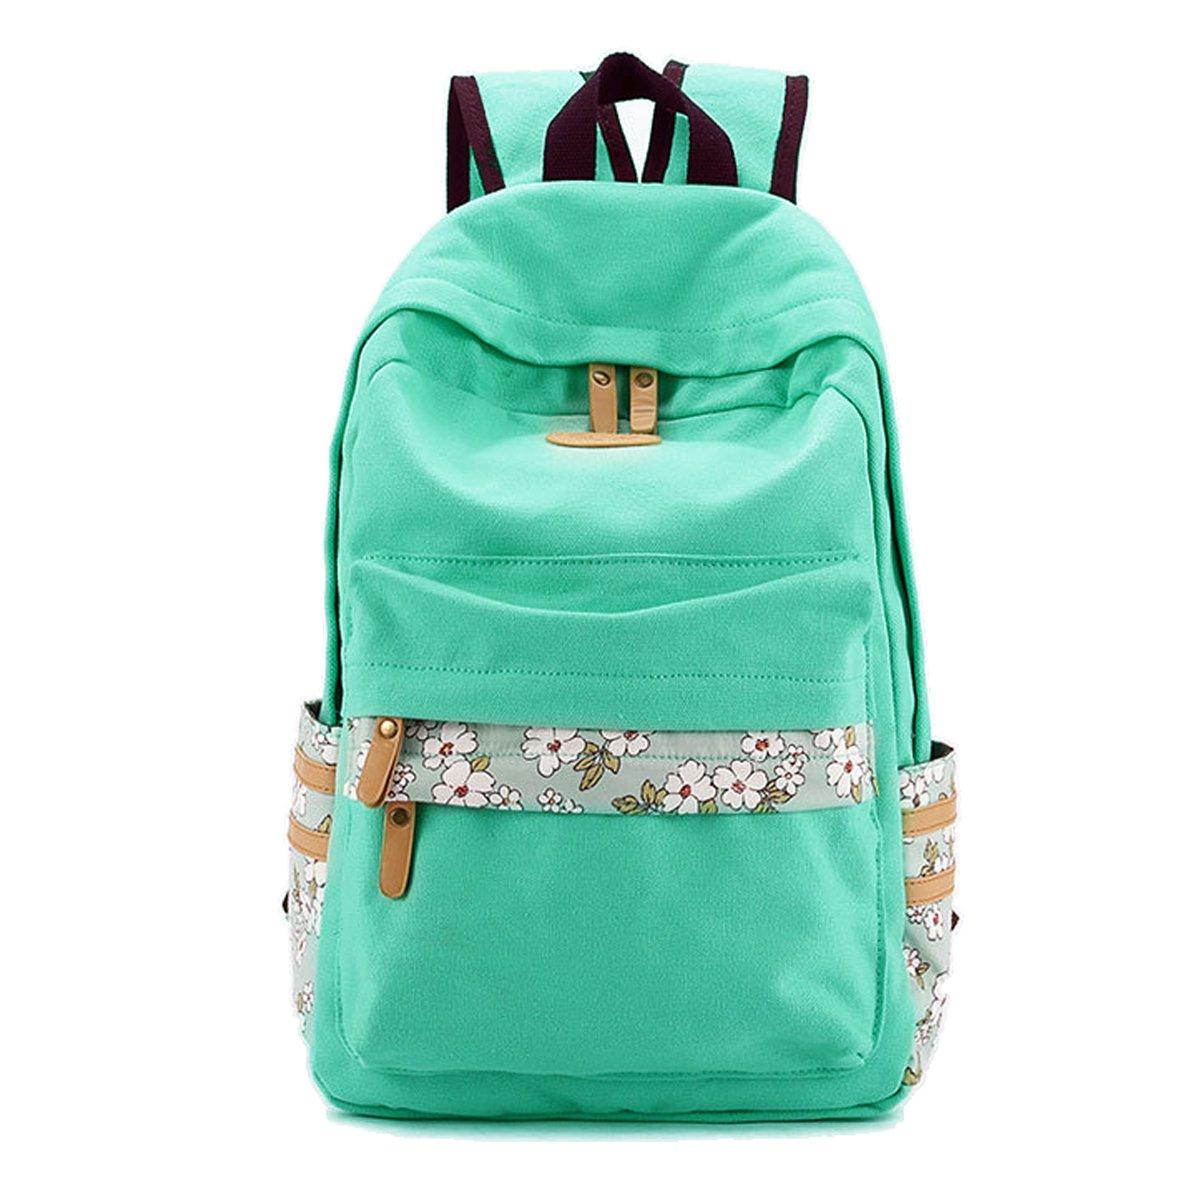 VentoMarea Lightweight Canvas Backpacks for Teen Girls School Bag Casual Travel Daypacks,Mint Green